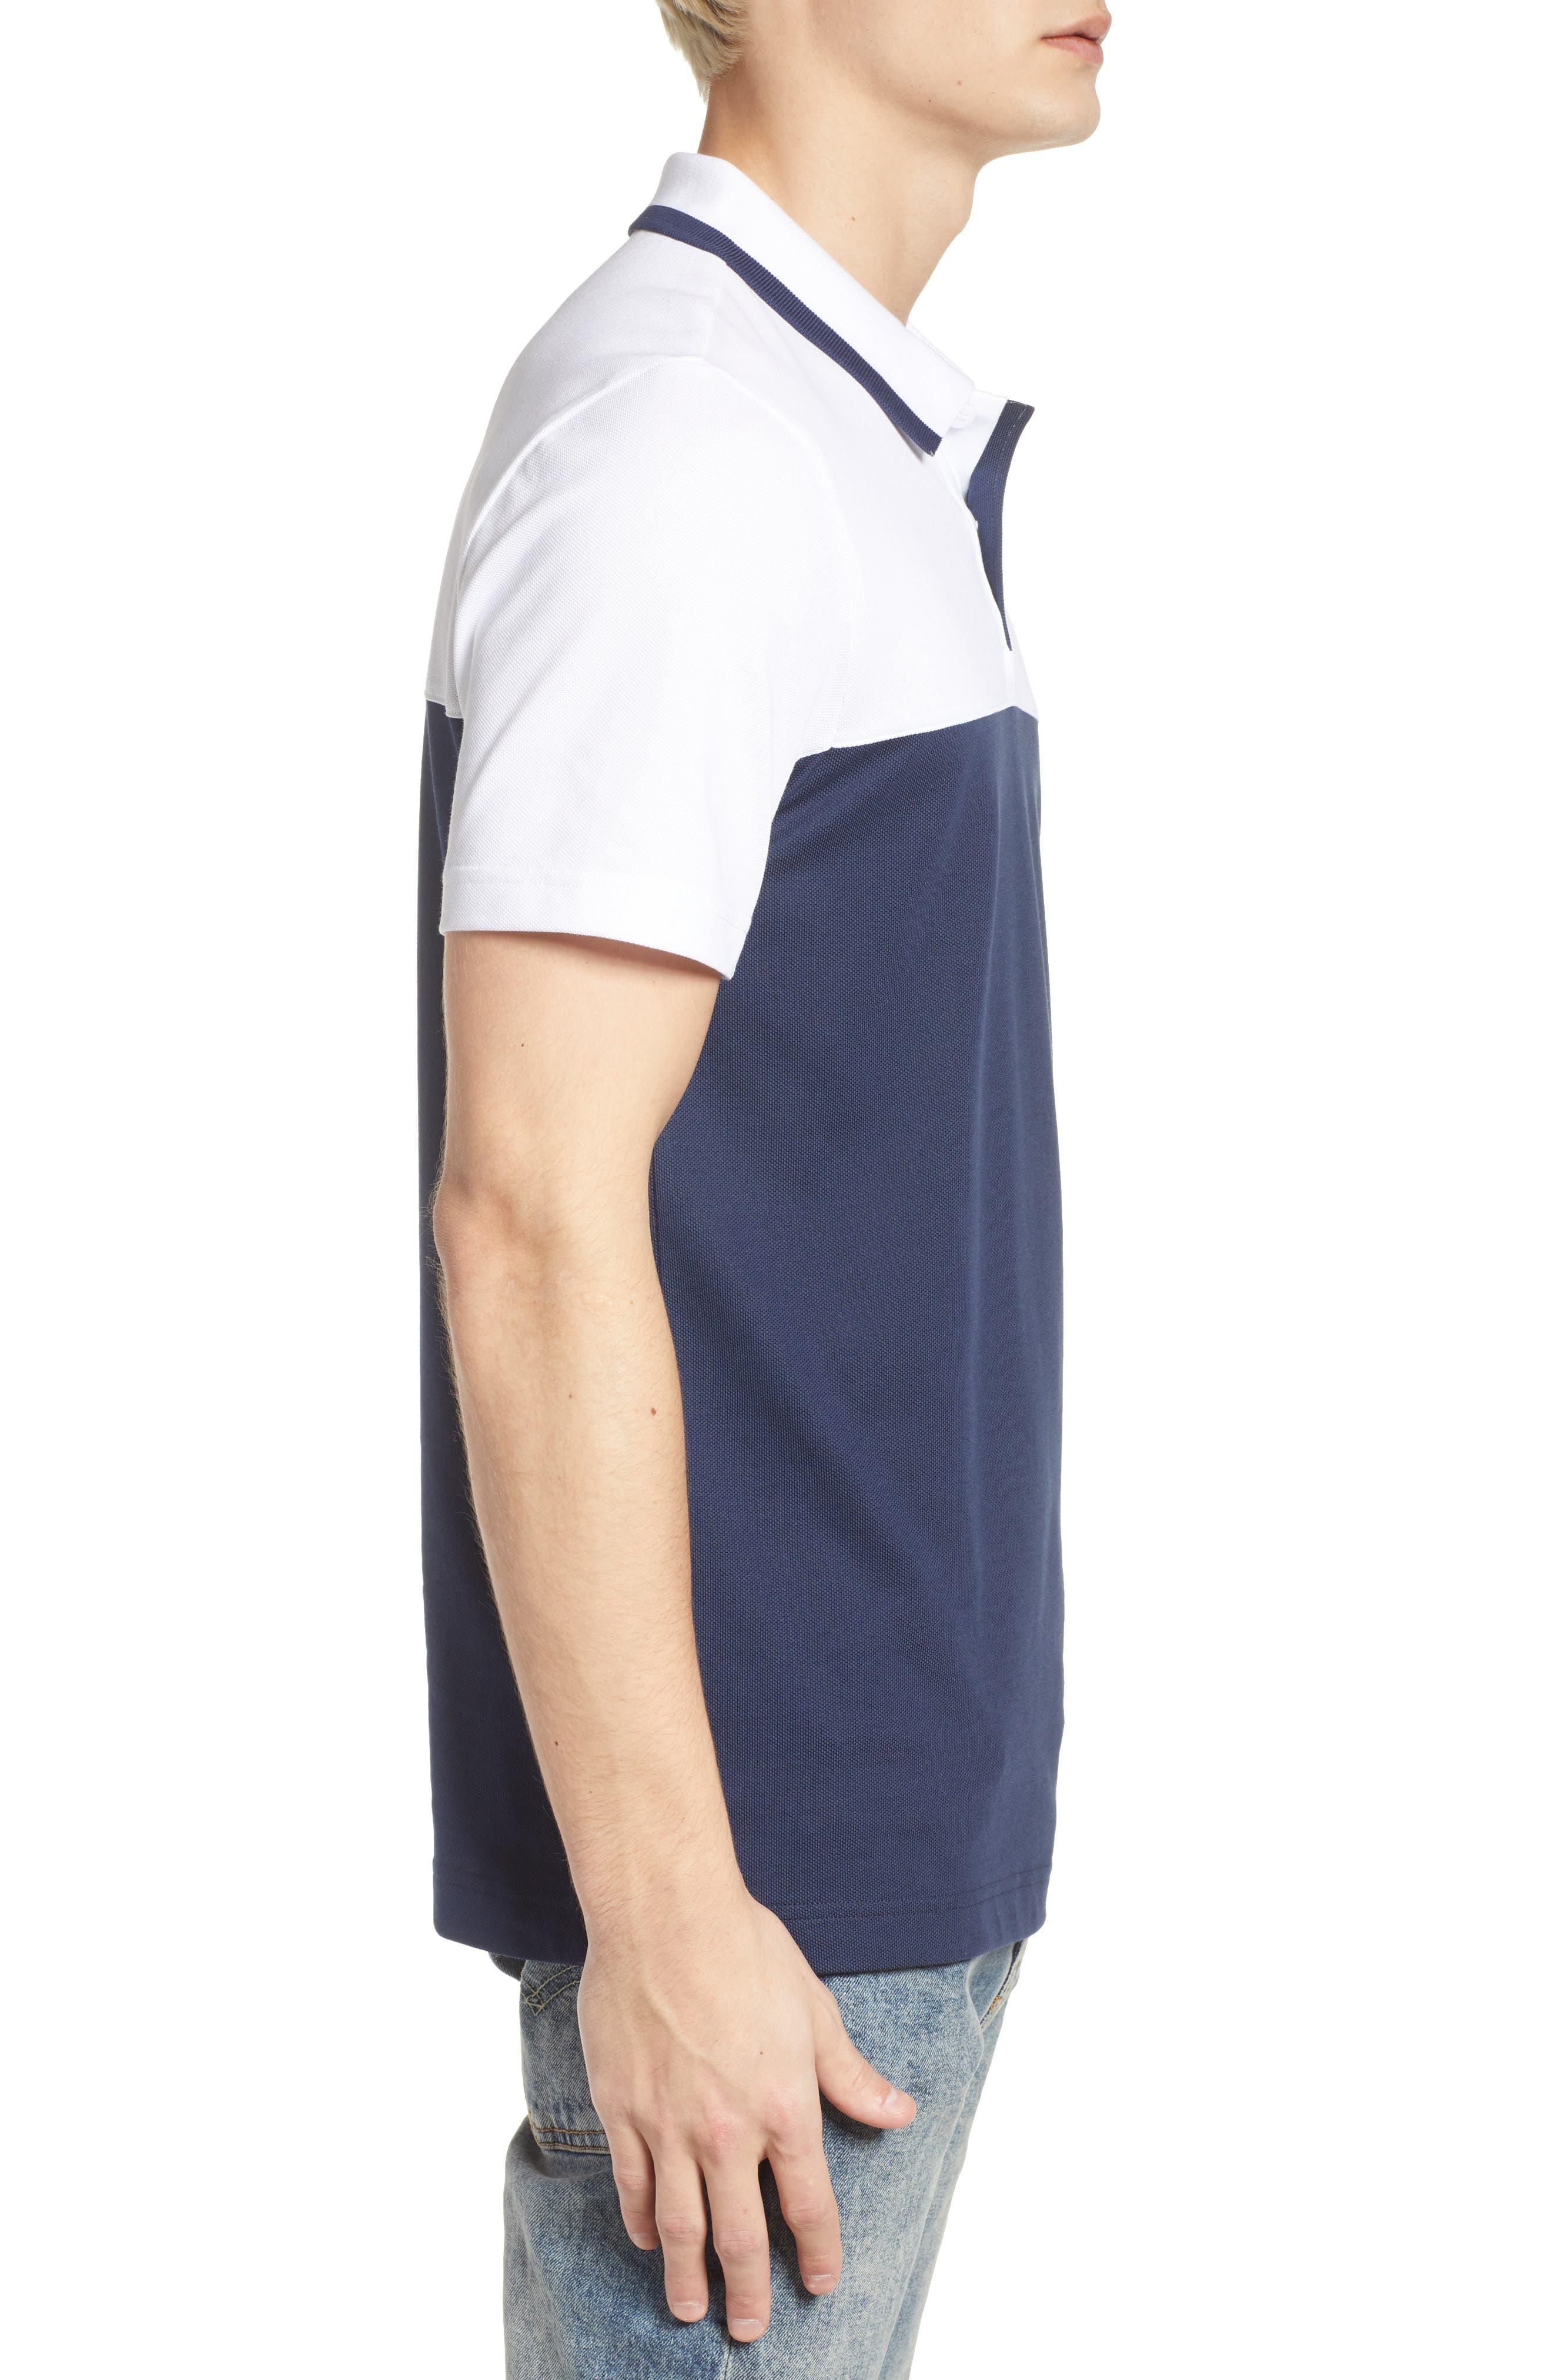 Piqué Cotton Blend Polo,                             Alternate thumbnail 3, color,                             White/ Navy Blue